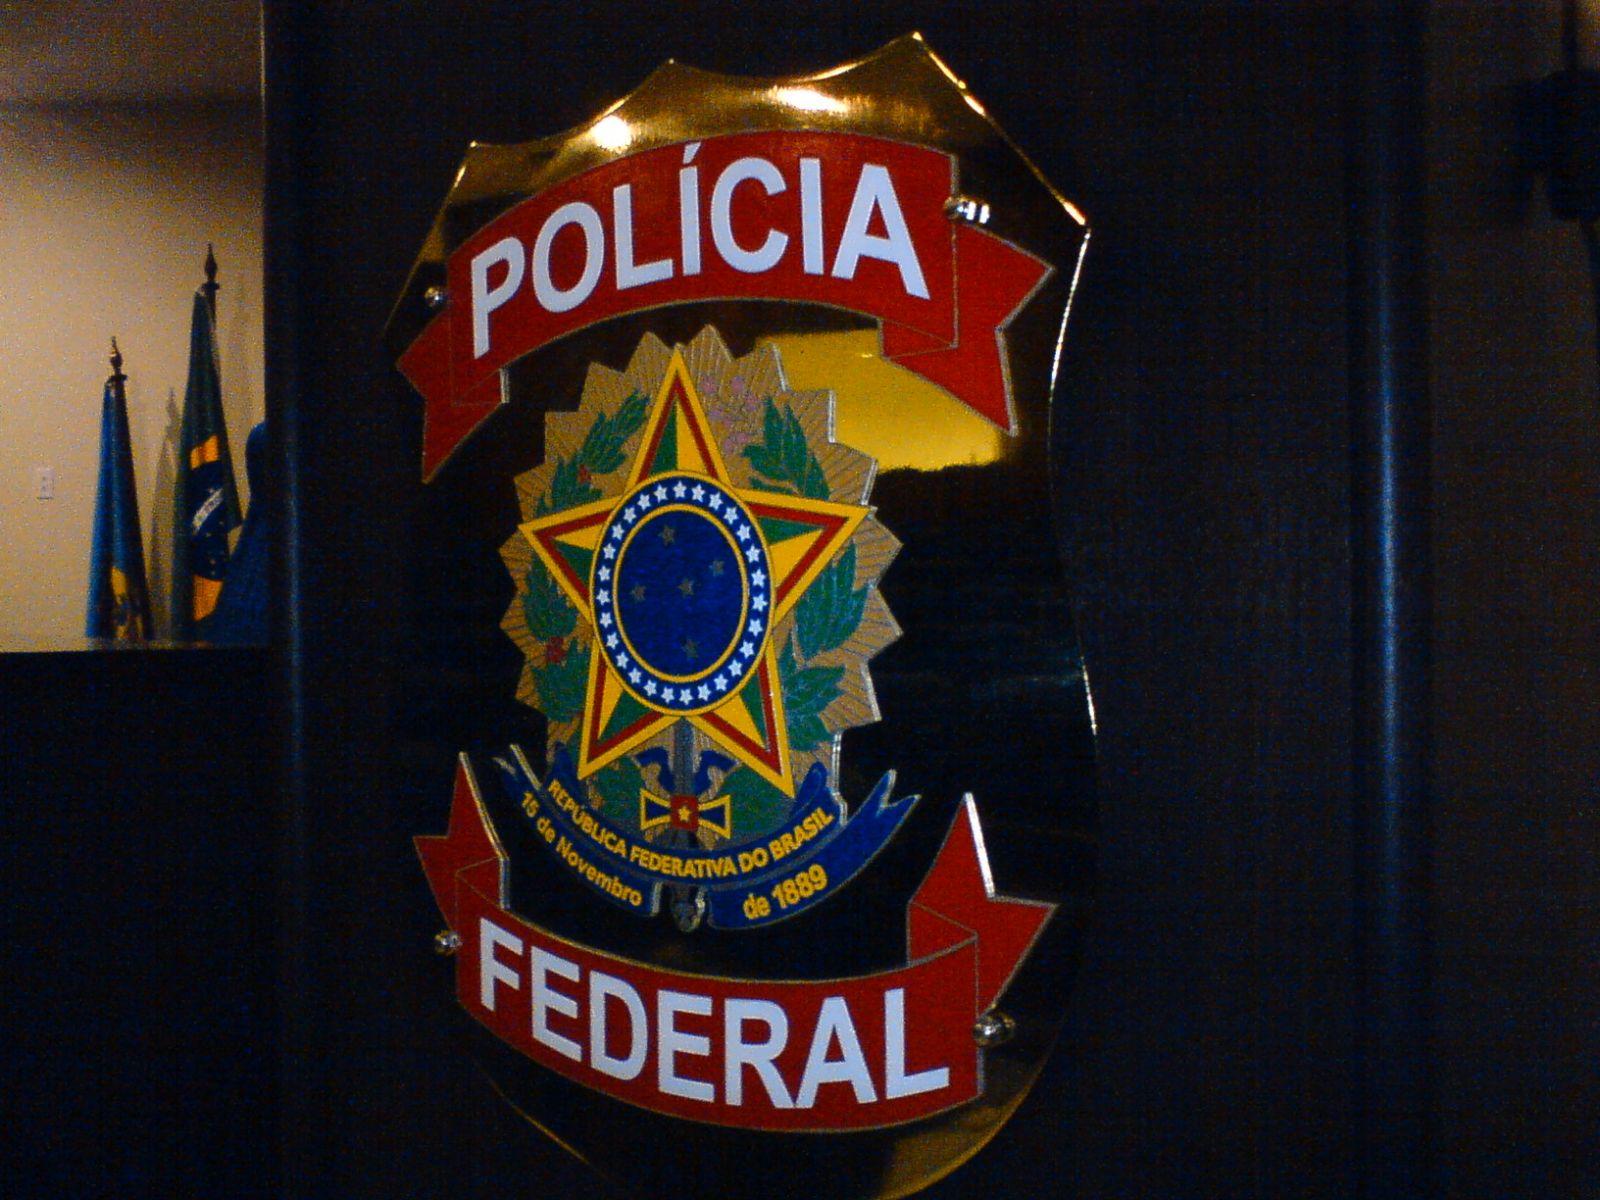 POLICIA-FEDERAL-070716.jpg